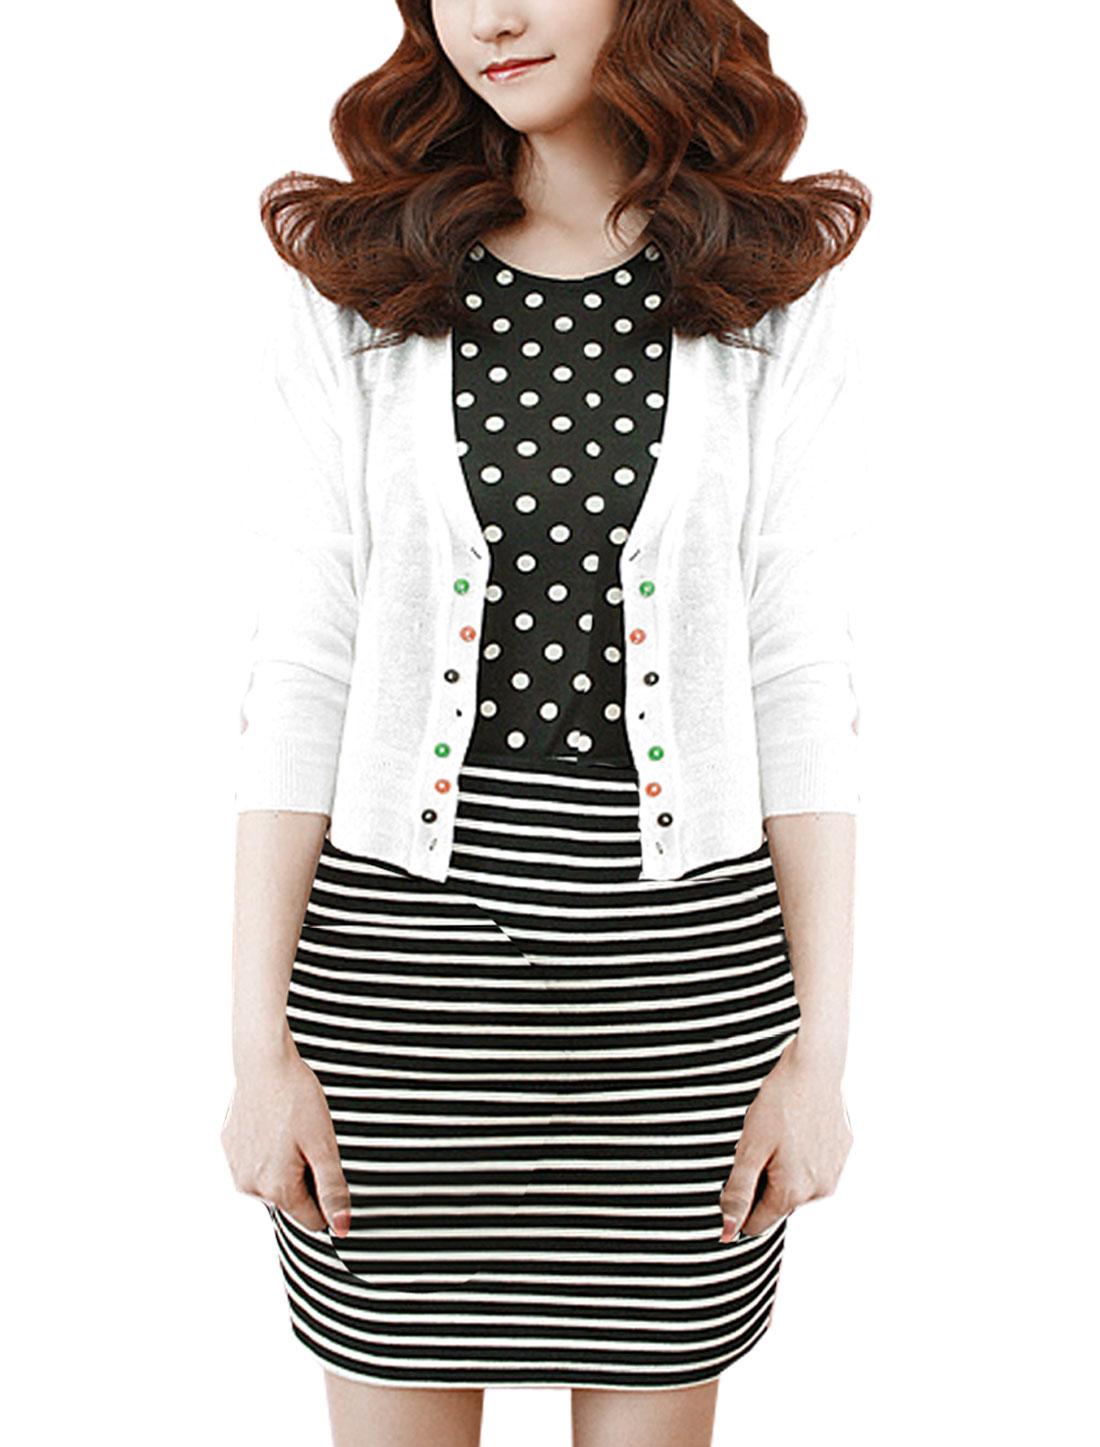 Woman Chic Long Sleeve Button Down Semi-Sheer White Bolero Shrug S